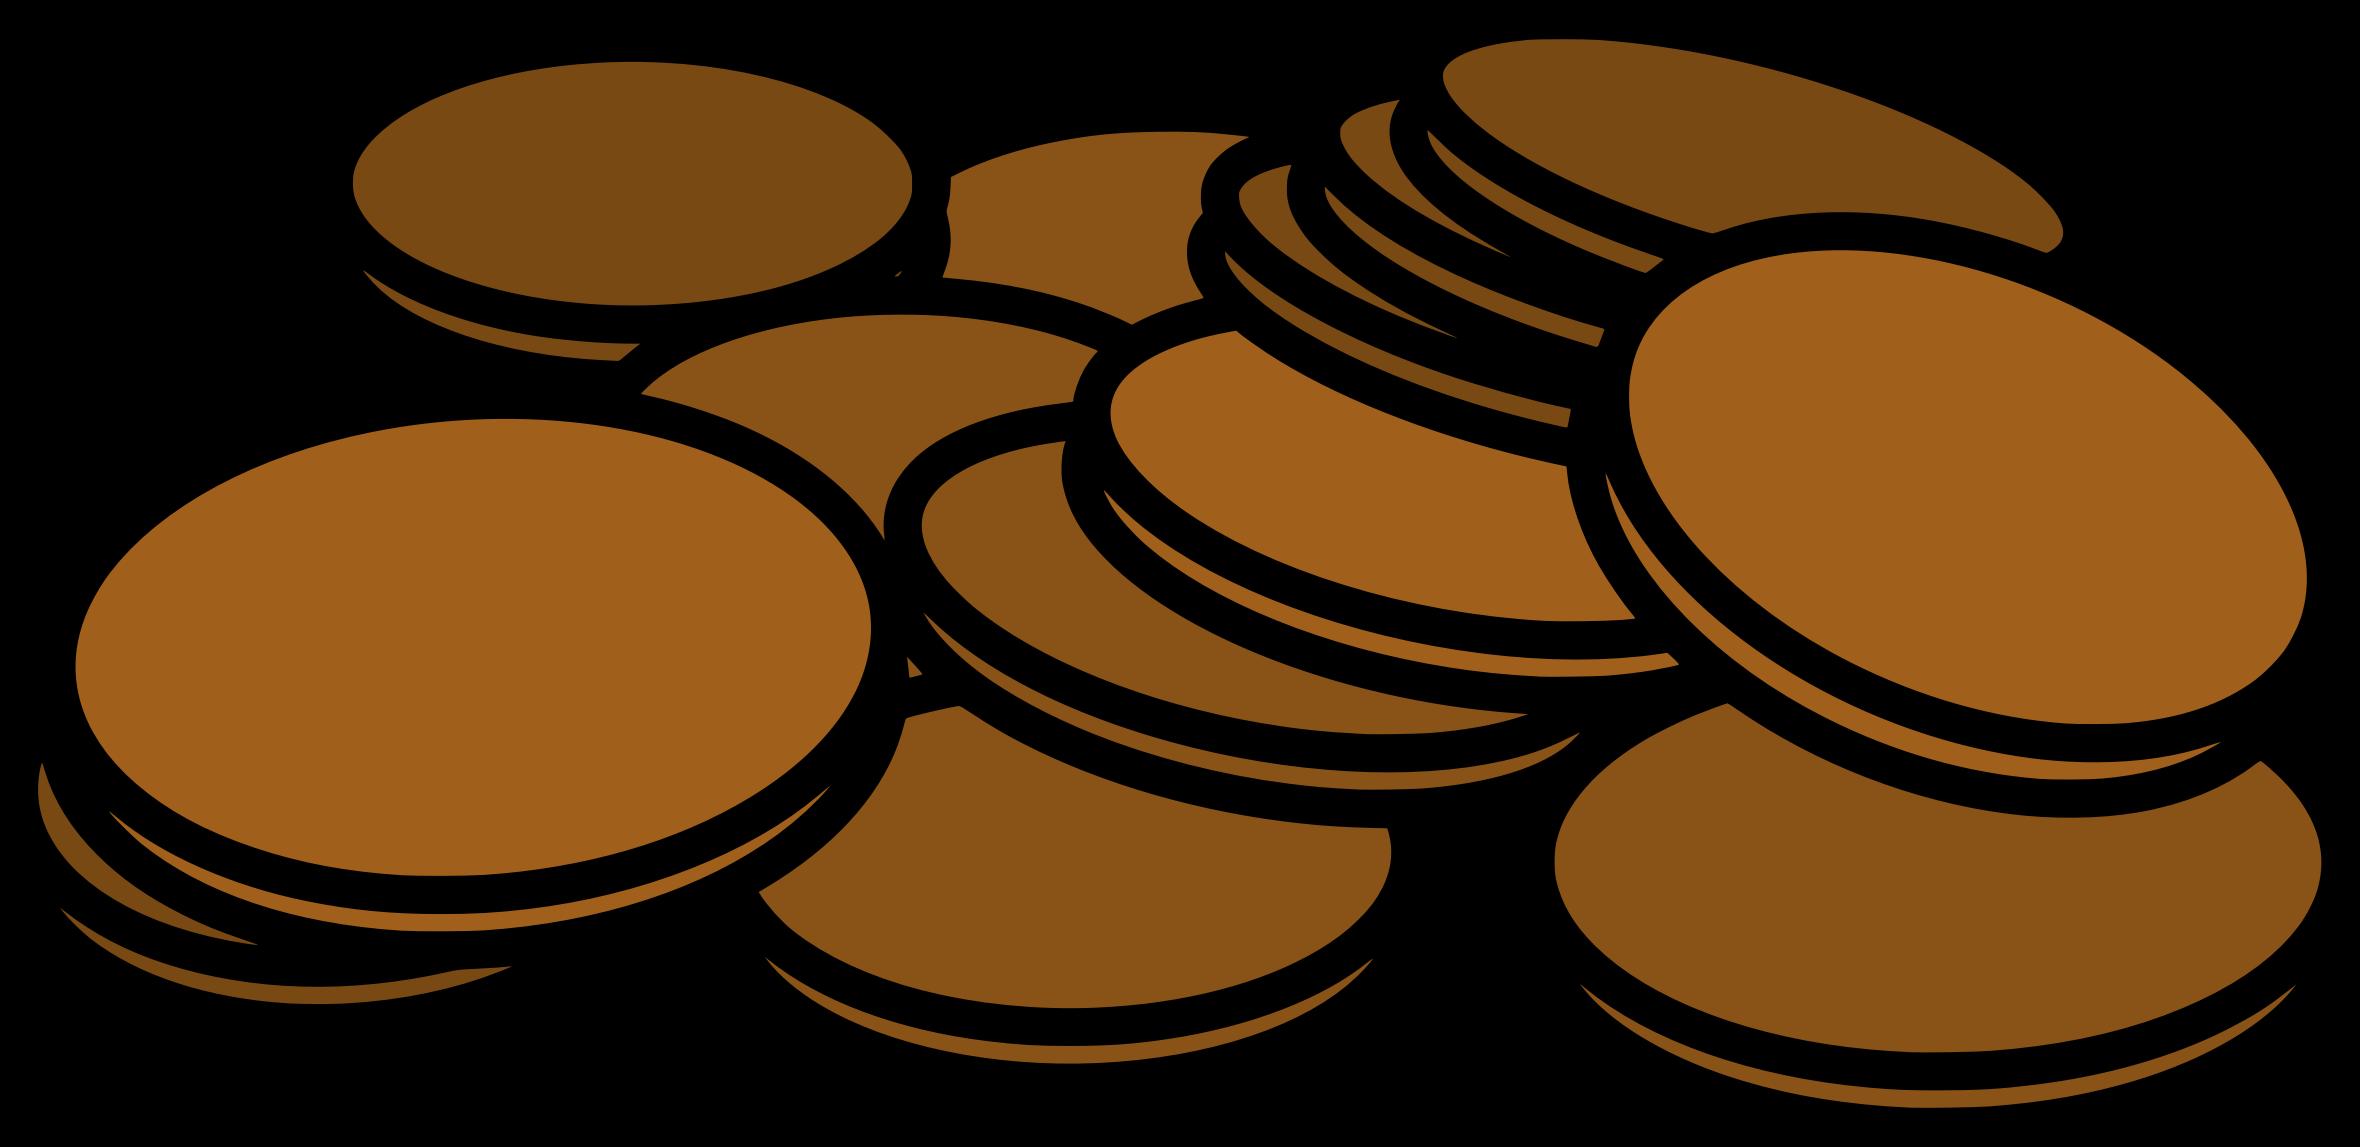 Pennies clip art.